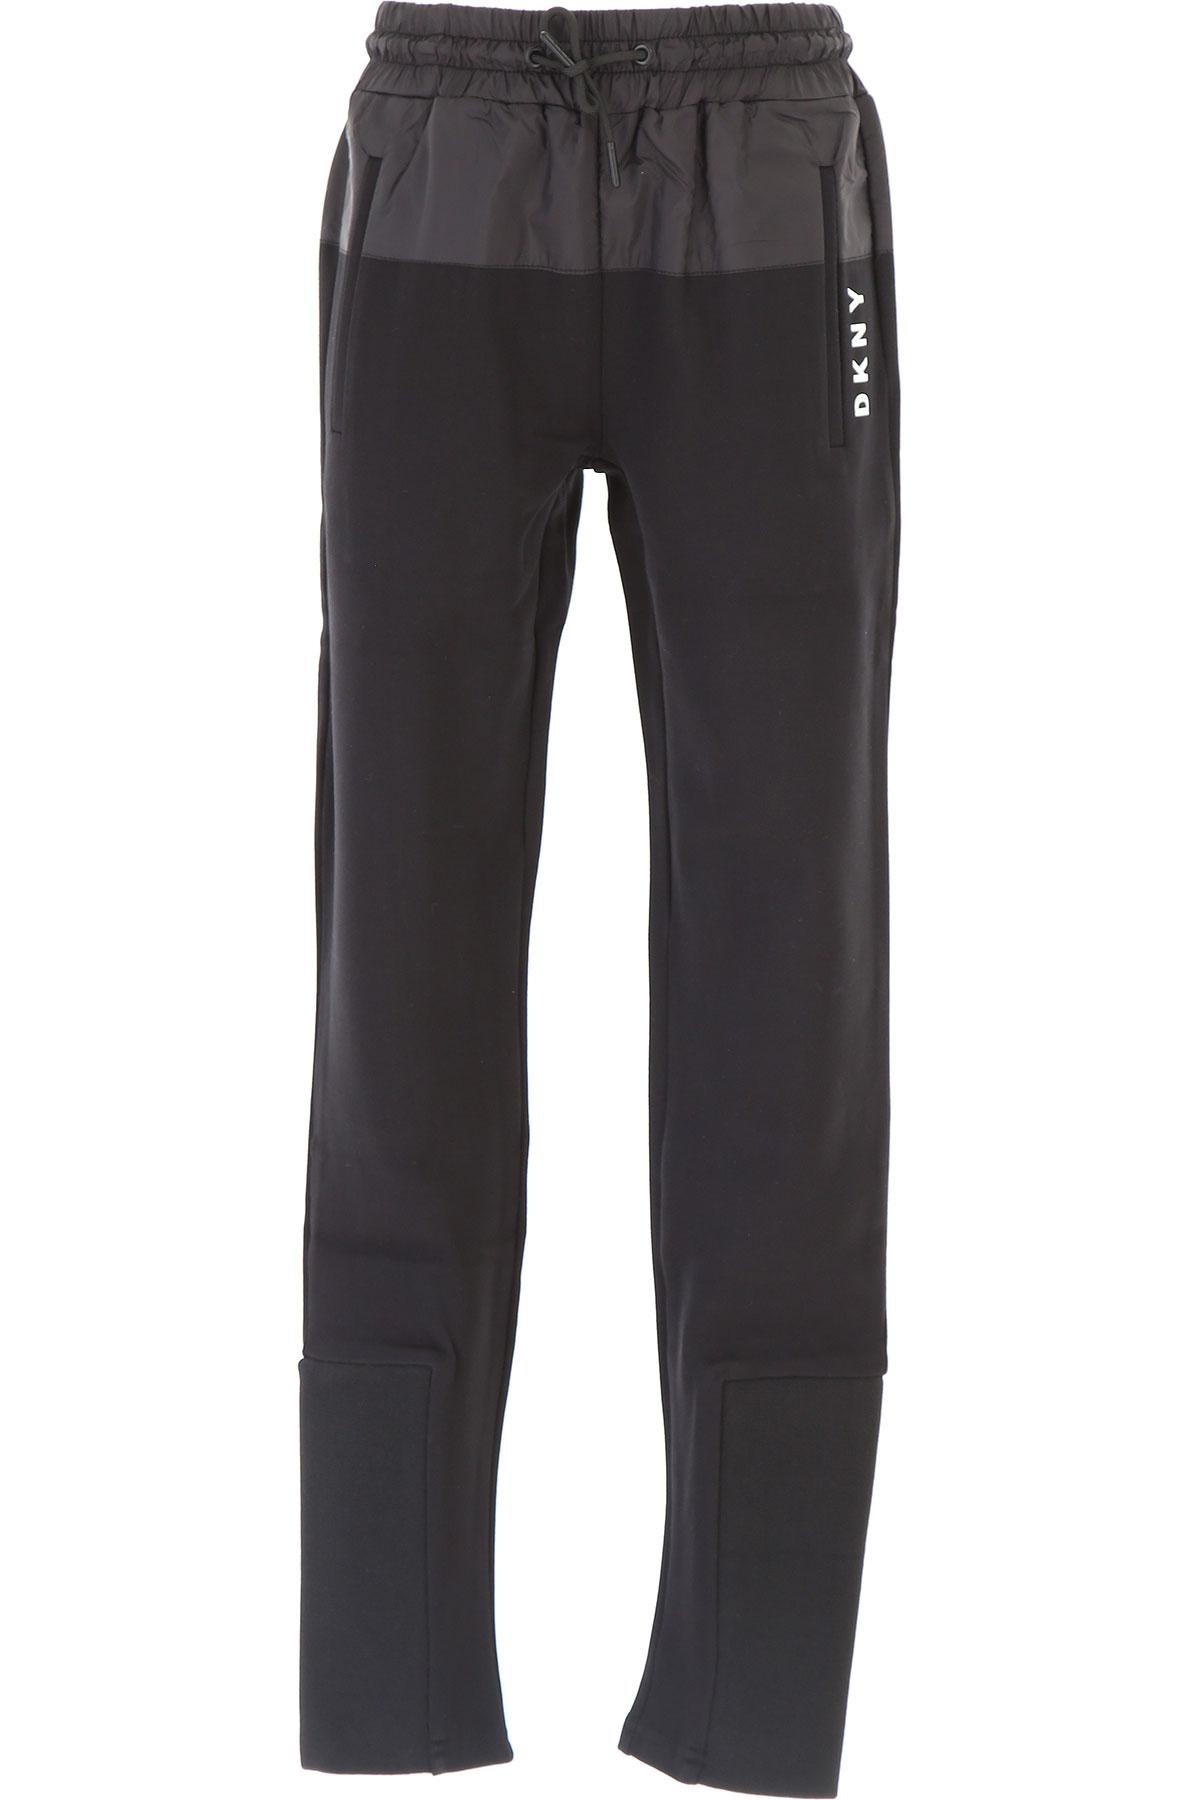 Image of DKNY Kids Sweatpants for Girls, Black, Viscose, 2017, 10Y 14Y 16Y 8Y